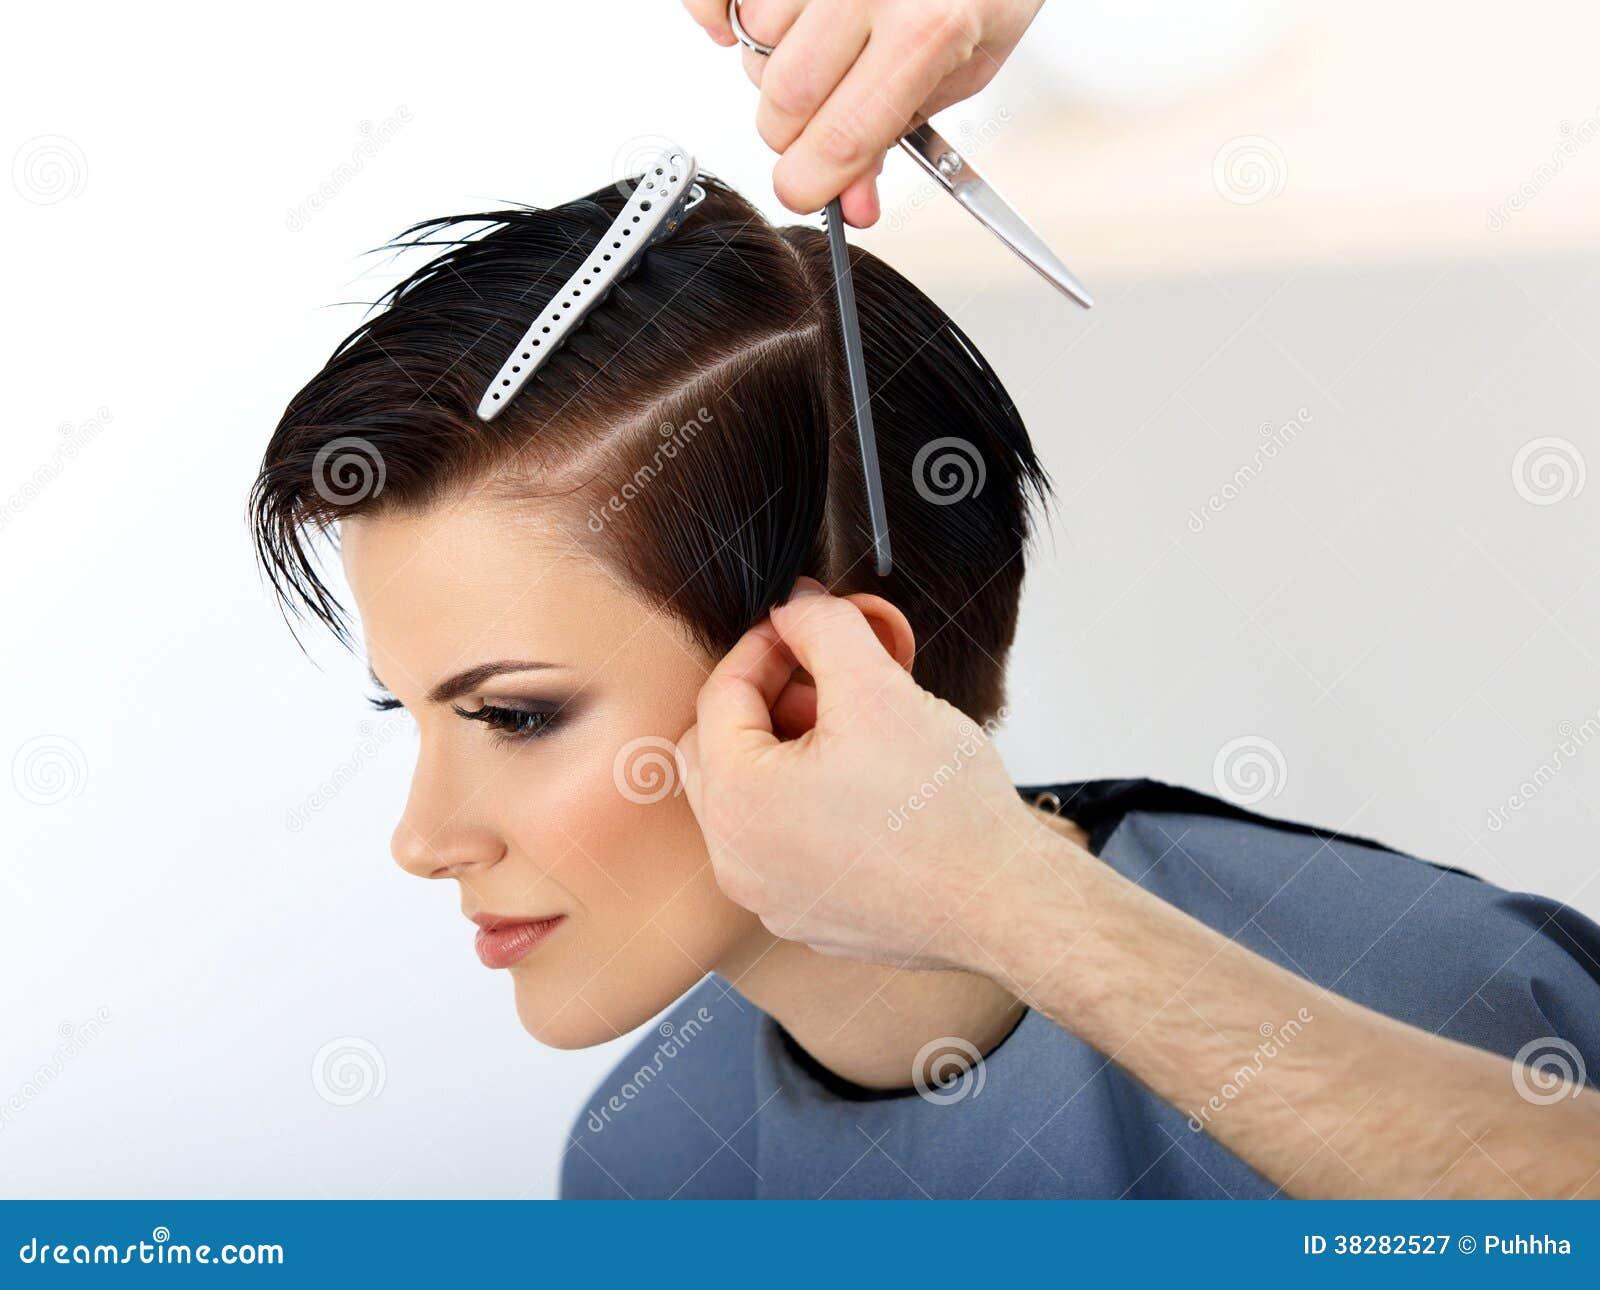 hair stock photos - photo #30